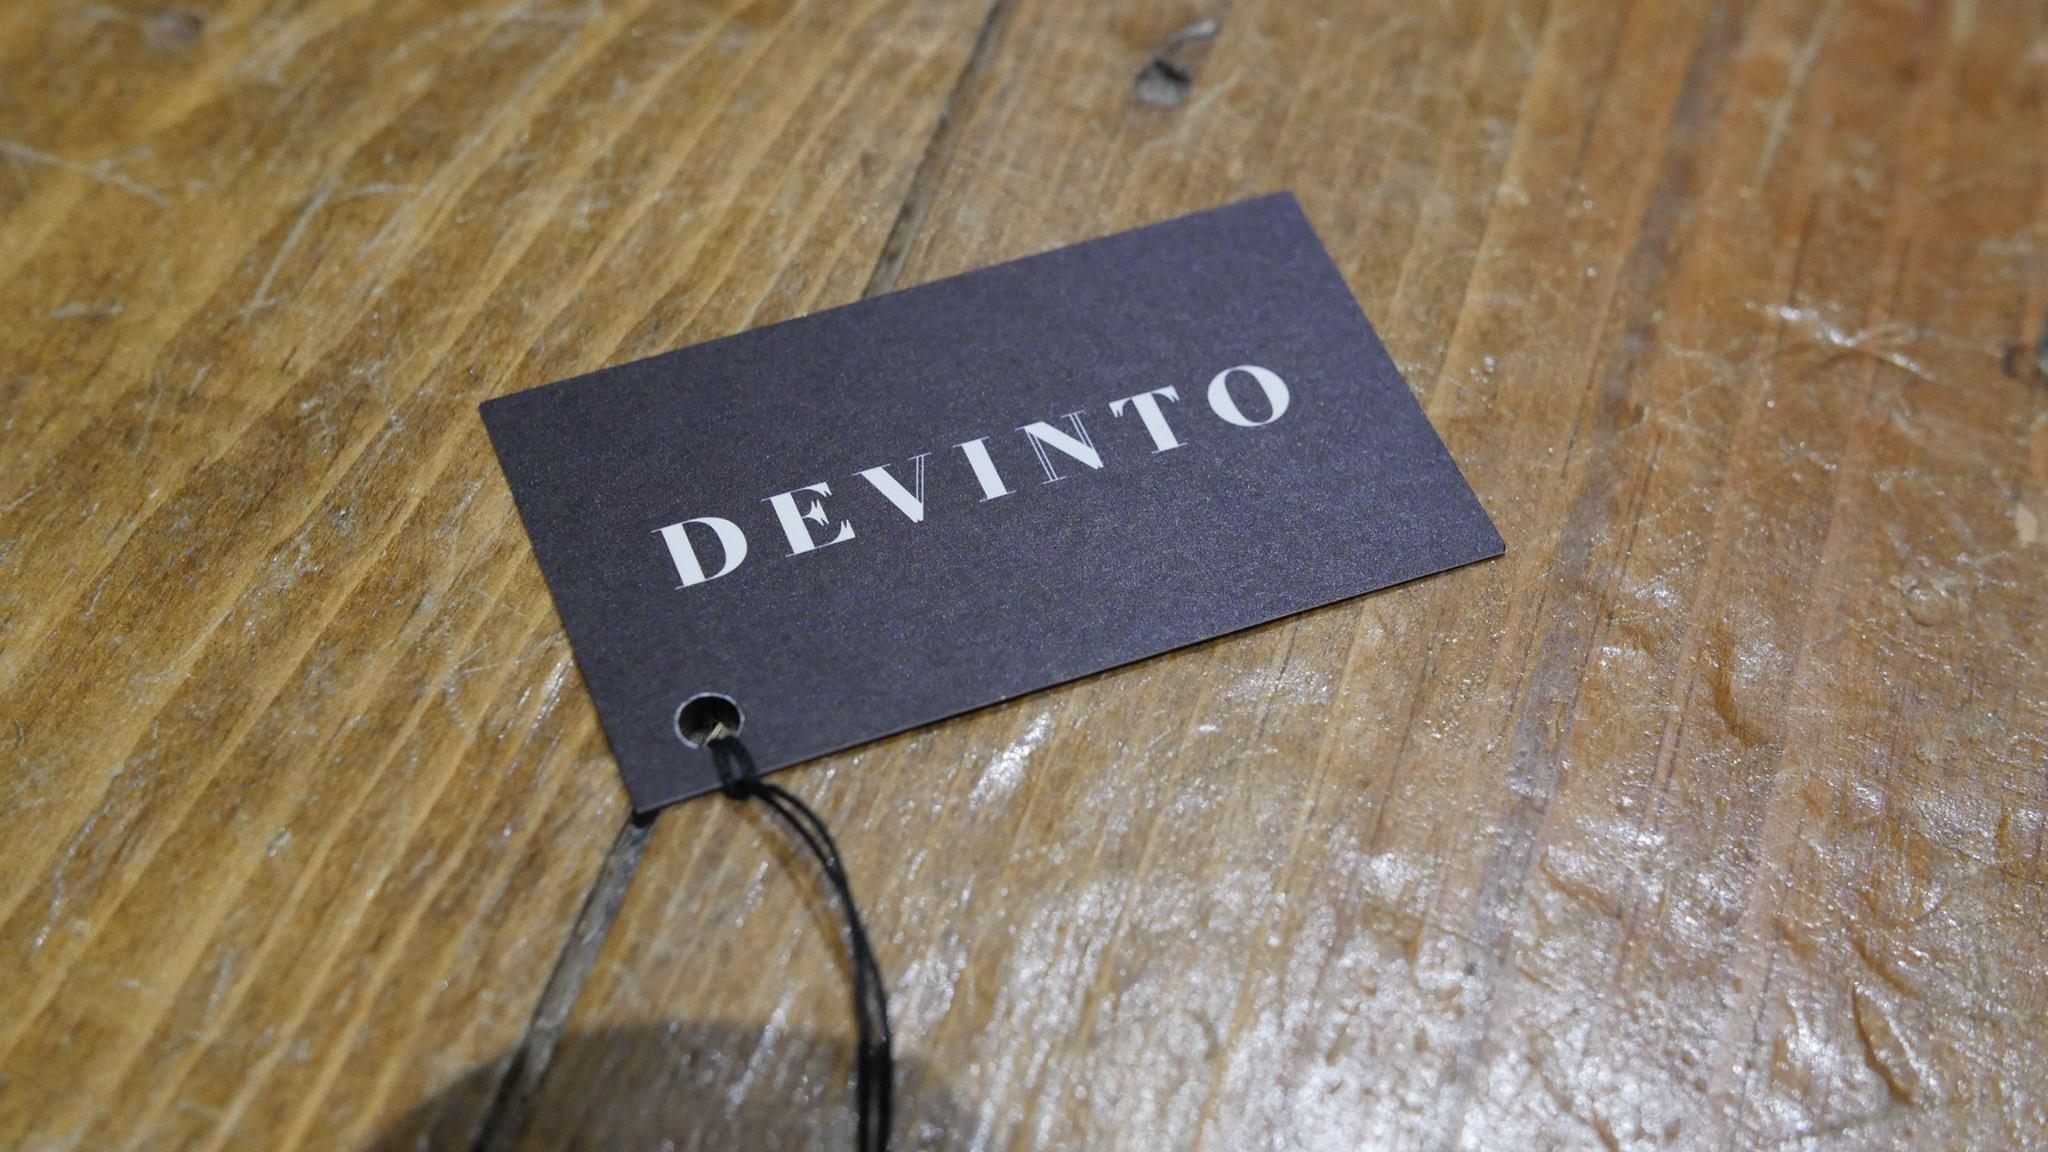 DEVINTO.jpg